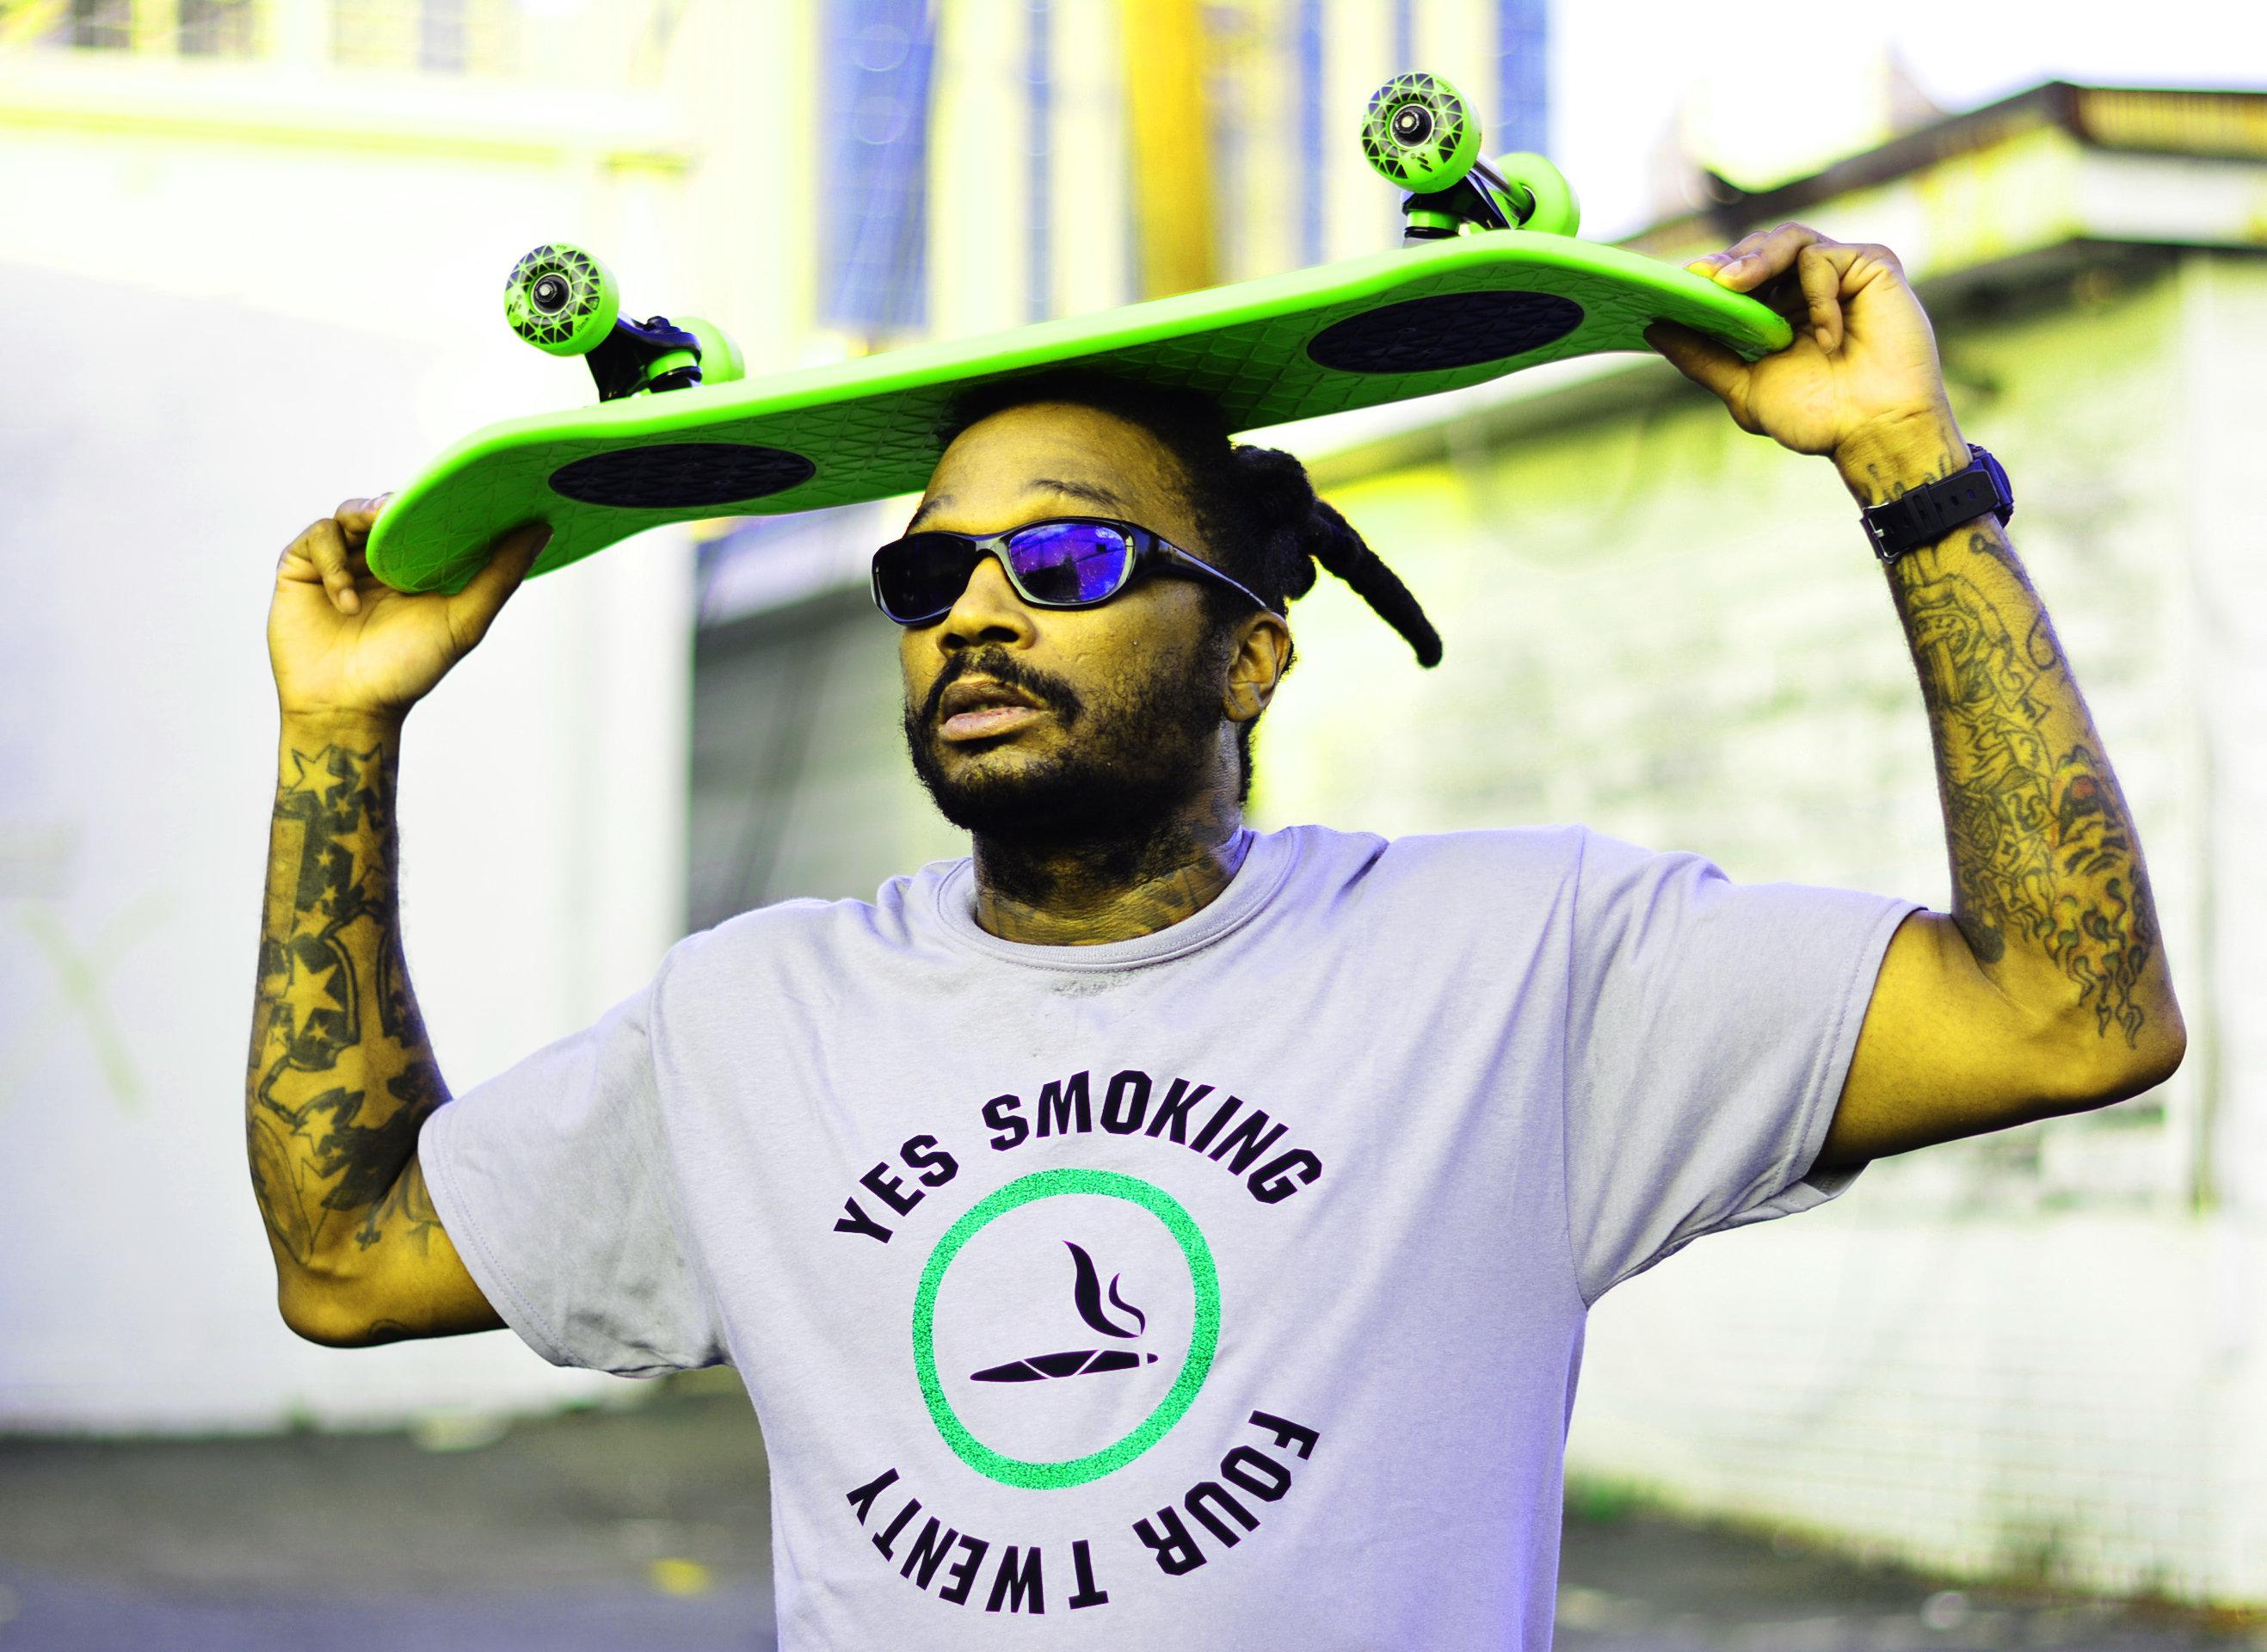 Gry Sports Yes Smoking 420 T-shirt 5.3oz 00000